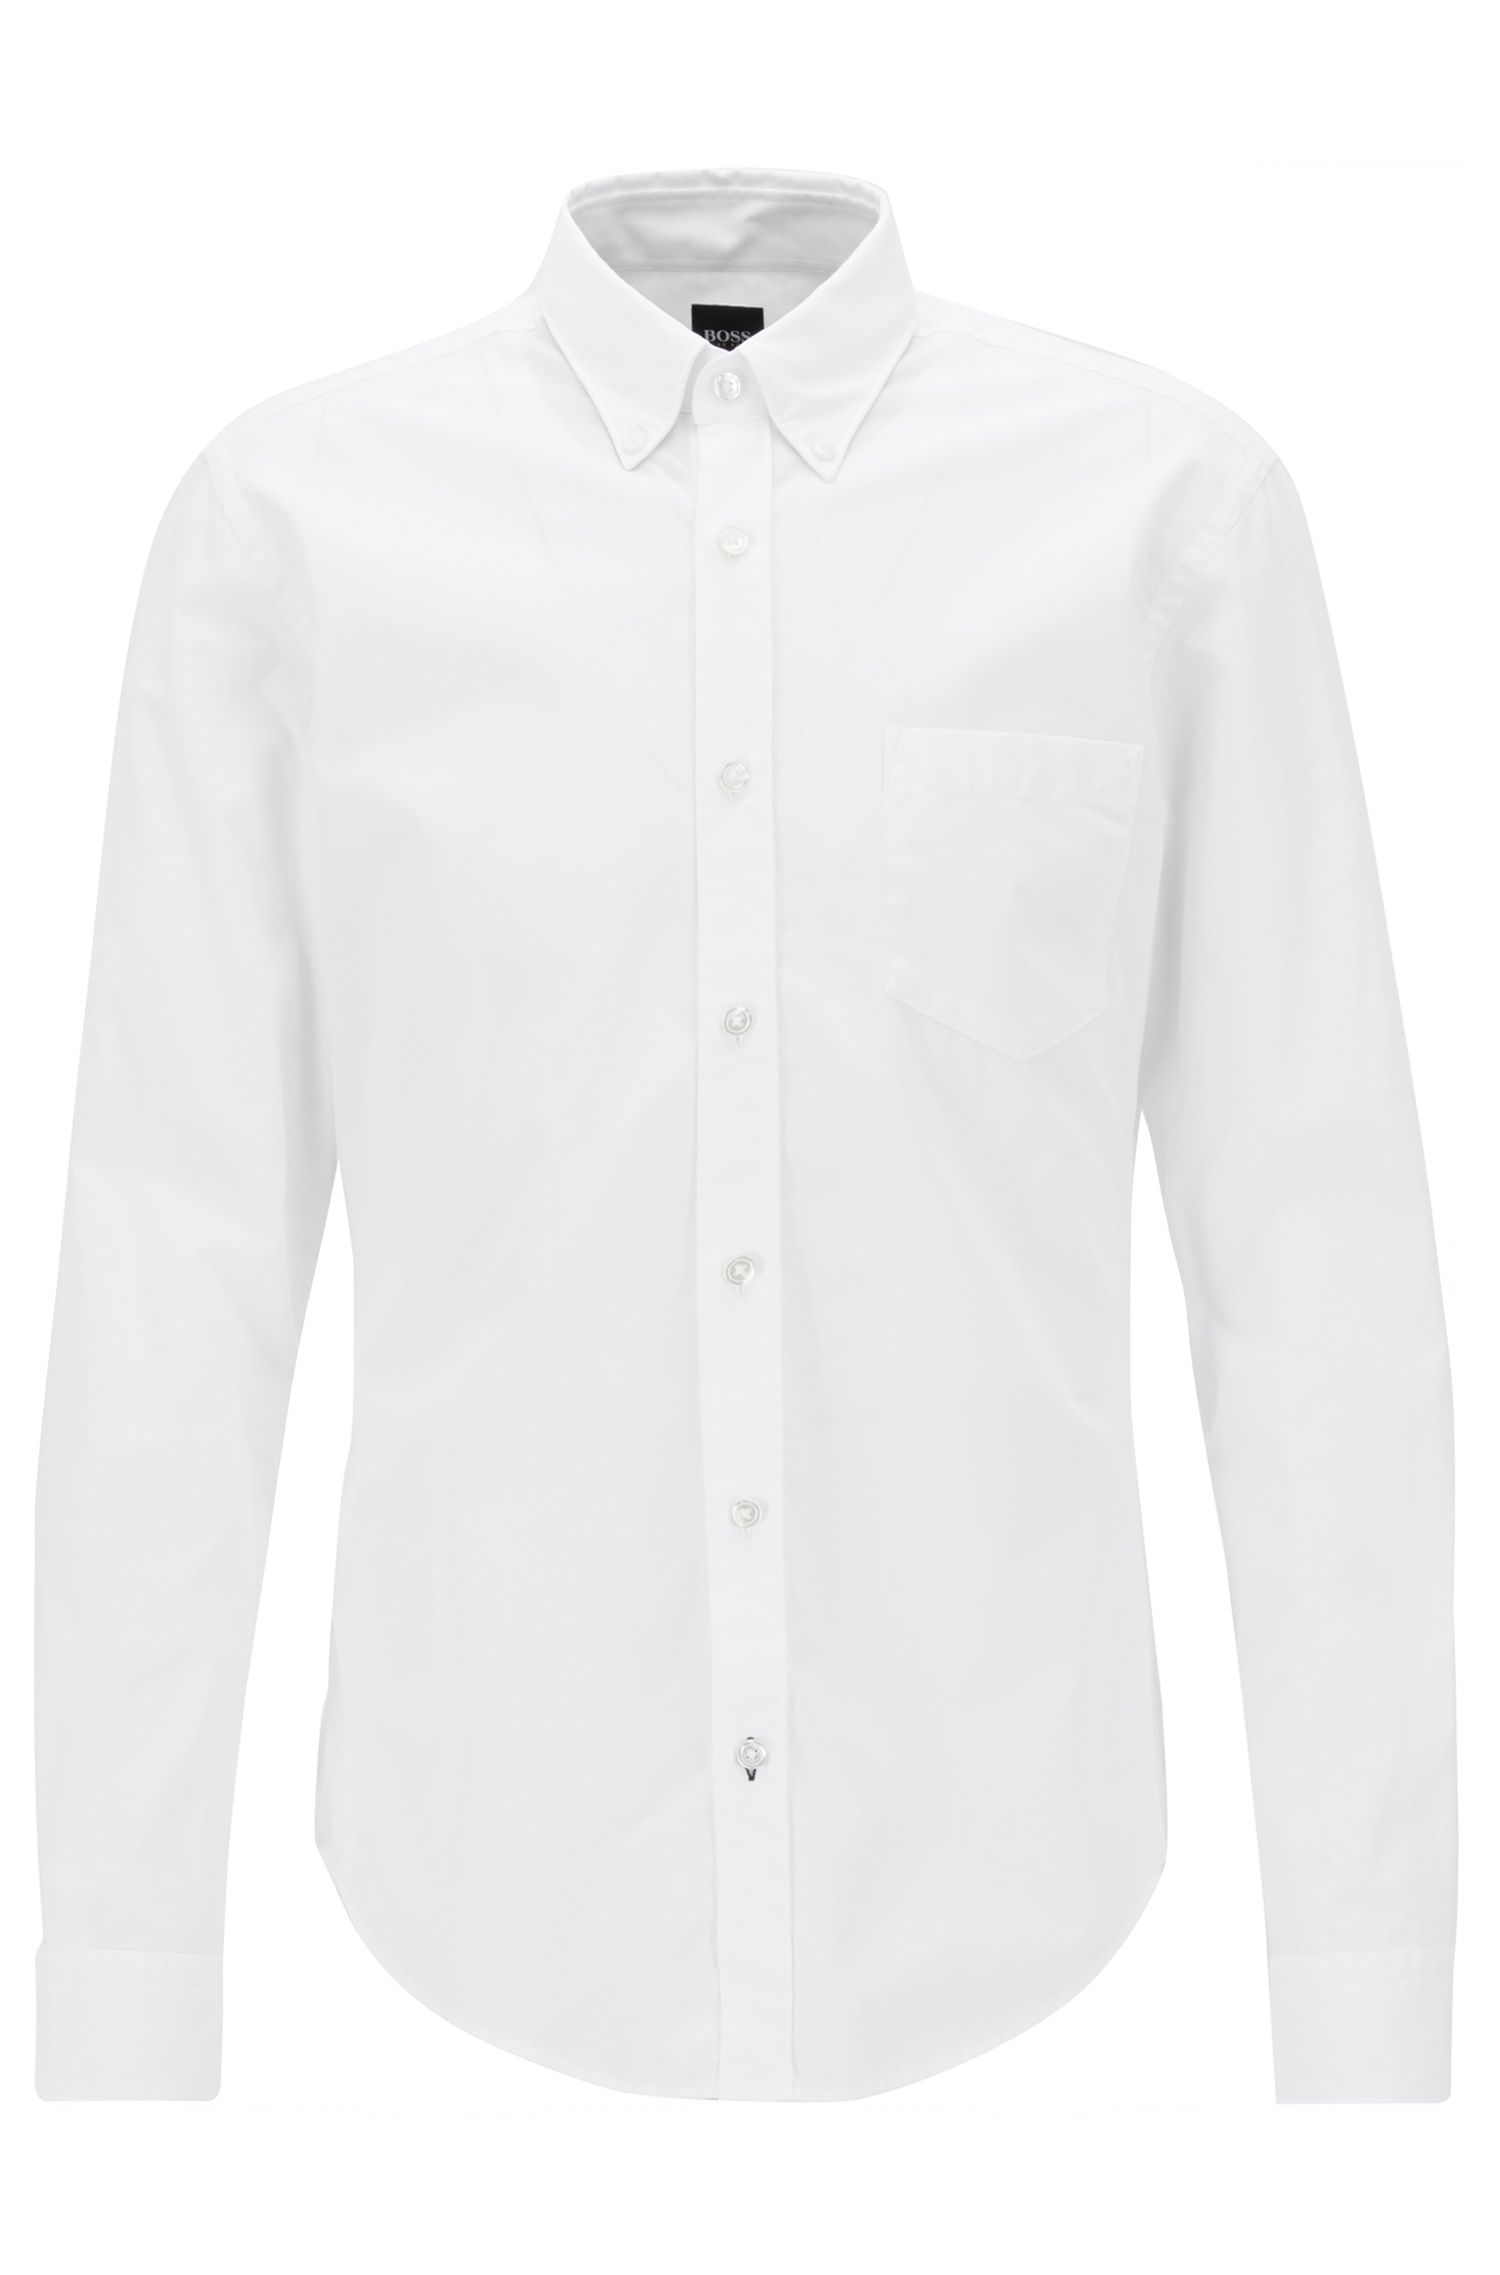 Camisa slim fit de manga larga en algodón fil a fil